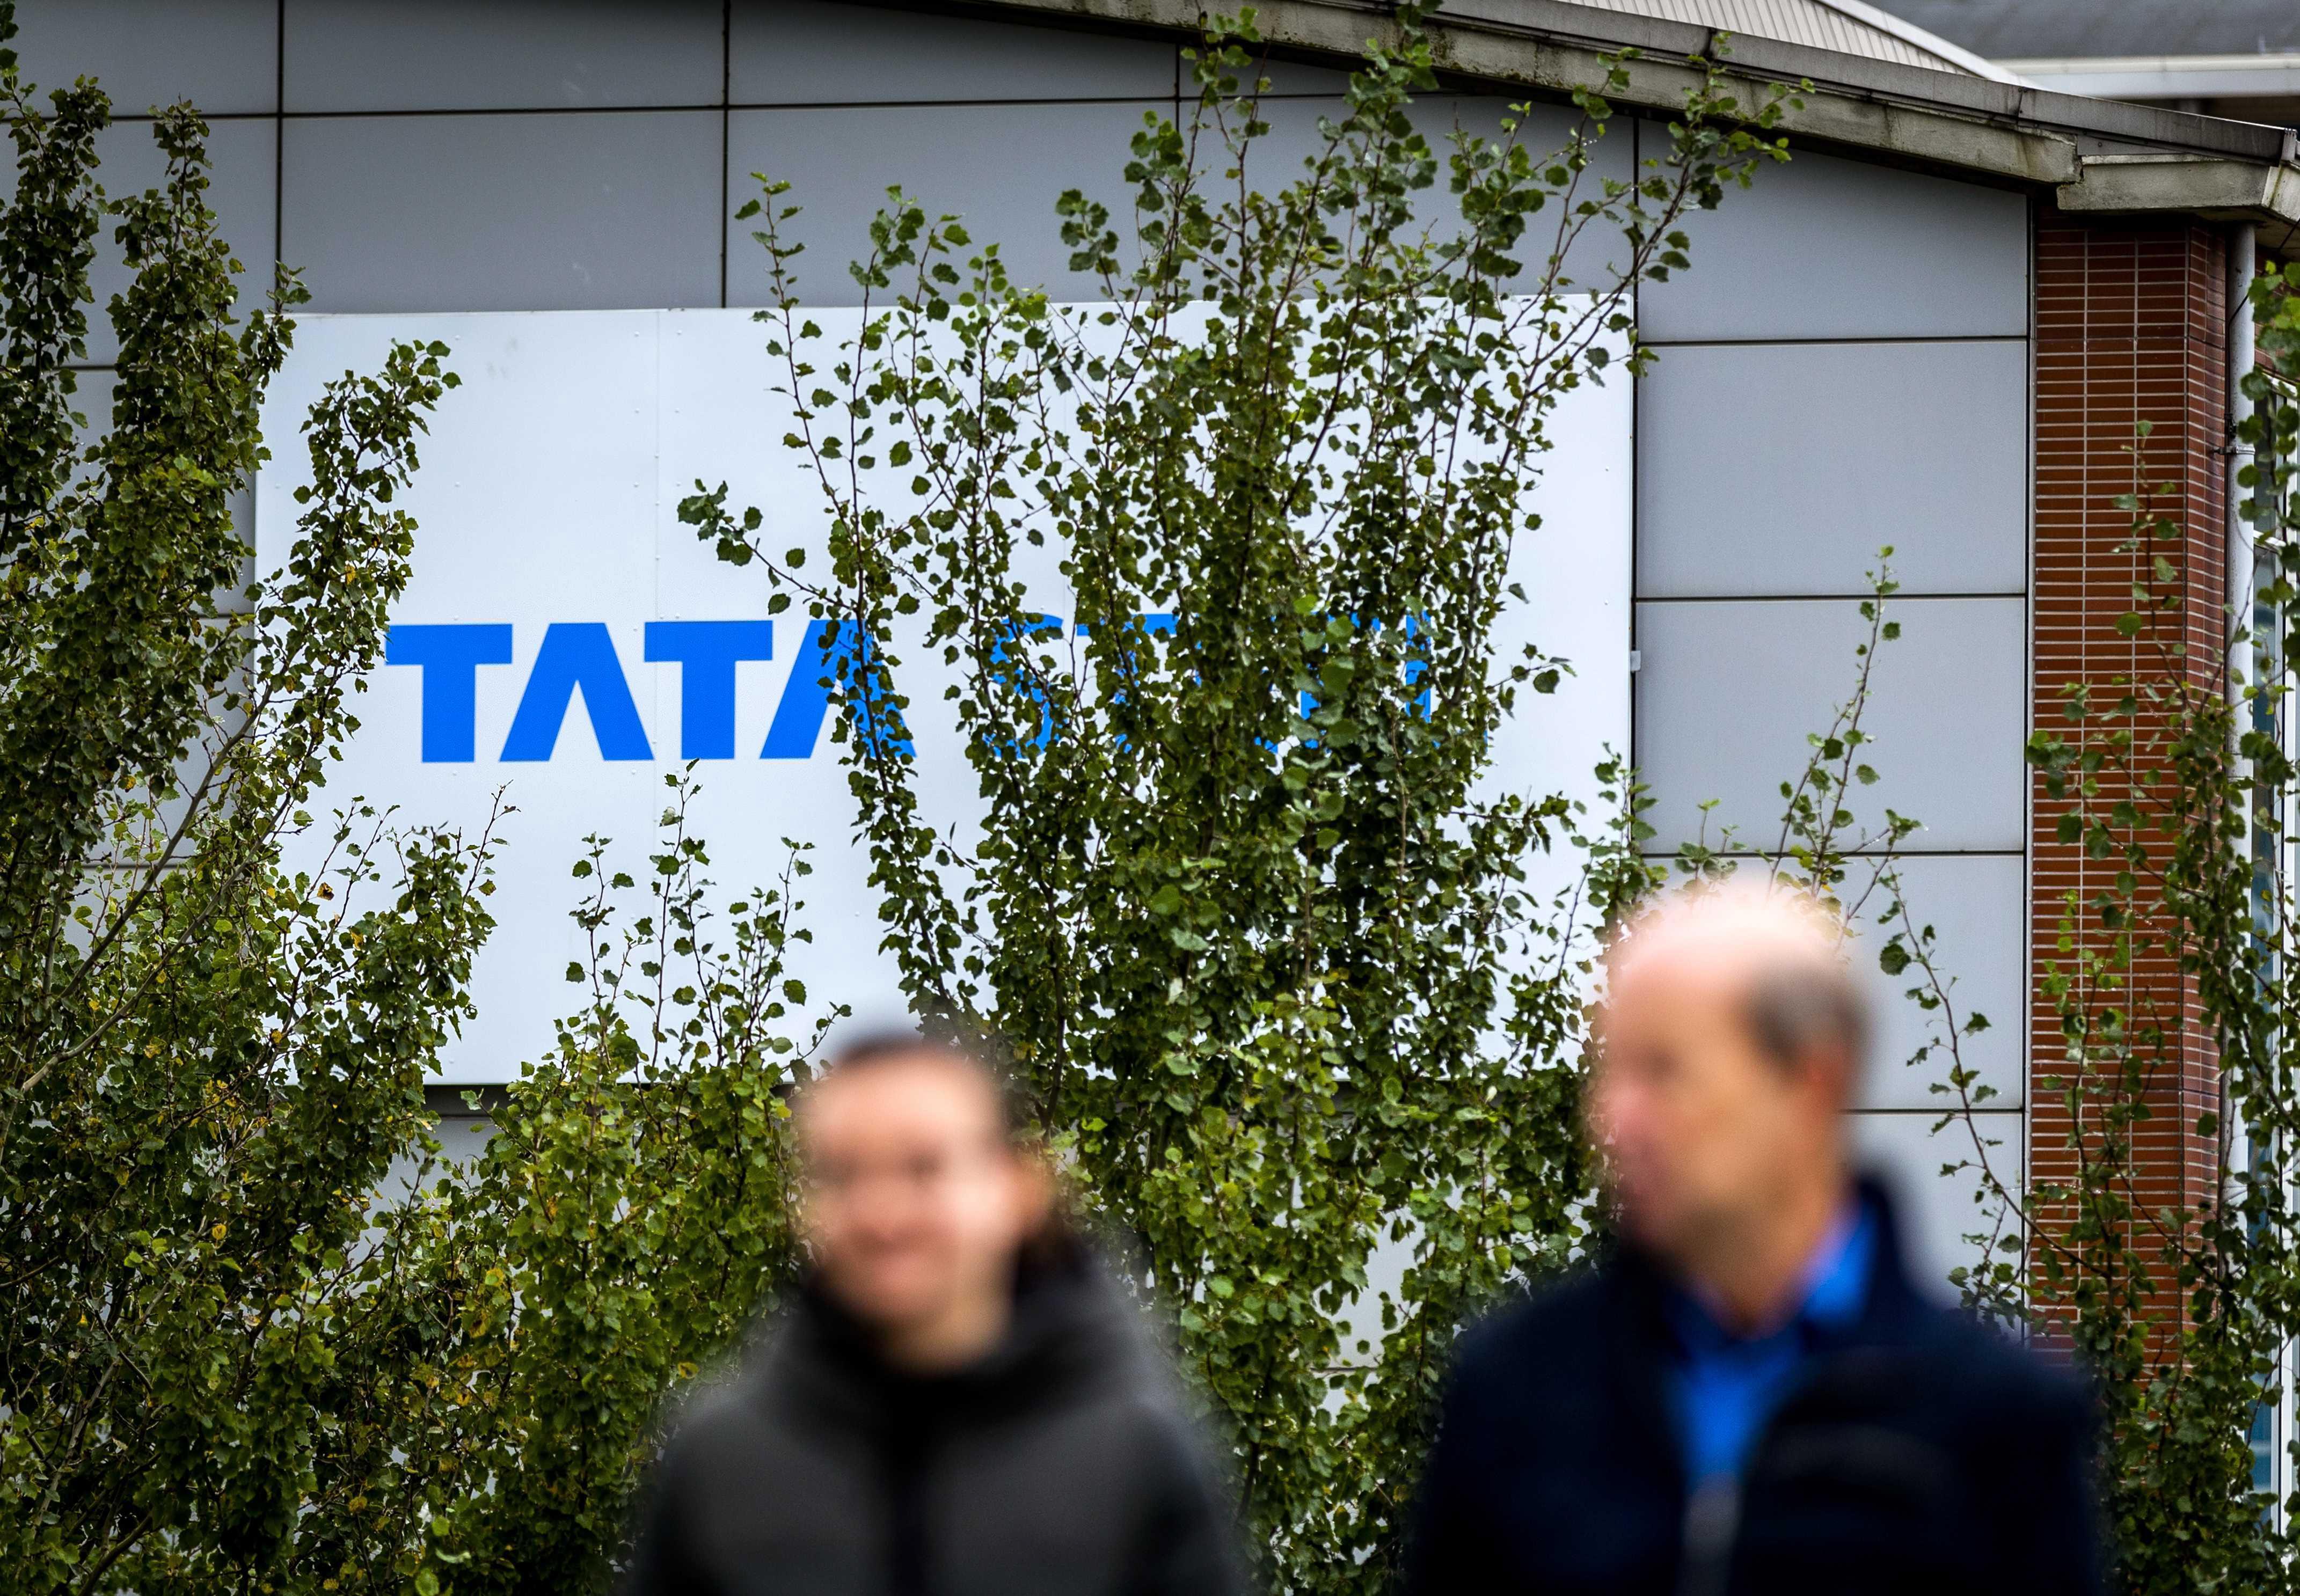 Tata Steel laat kantoorpersoneel donderdag op proef 1 dag thuiswerken, na ontdekking tweede coronabesmetting bij staalfabriek